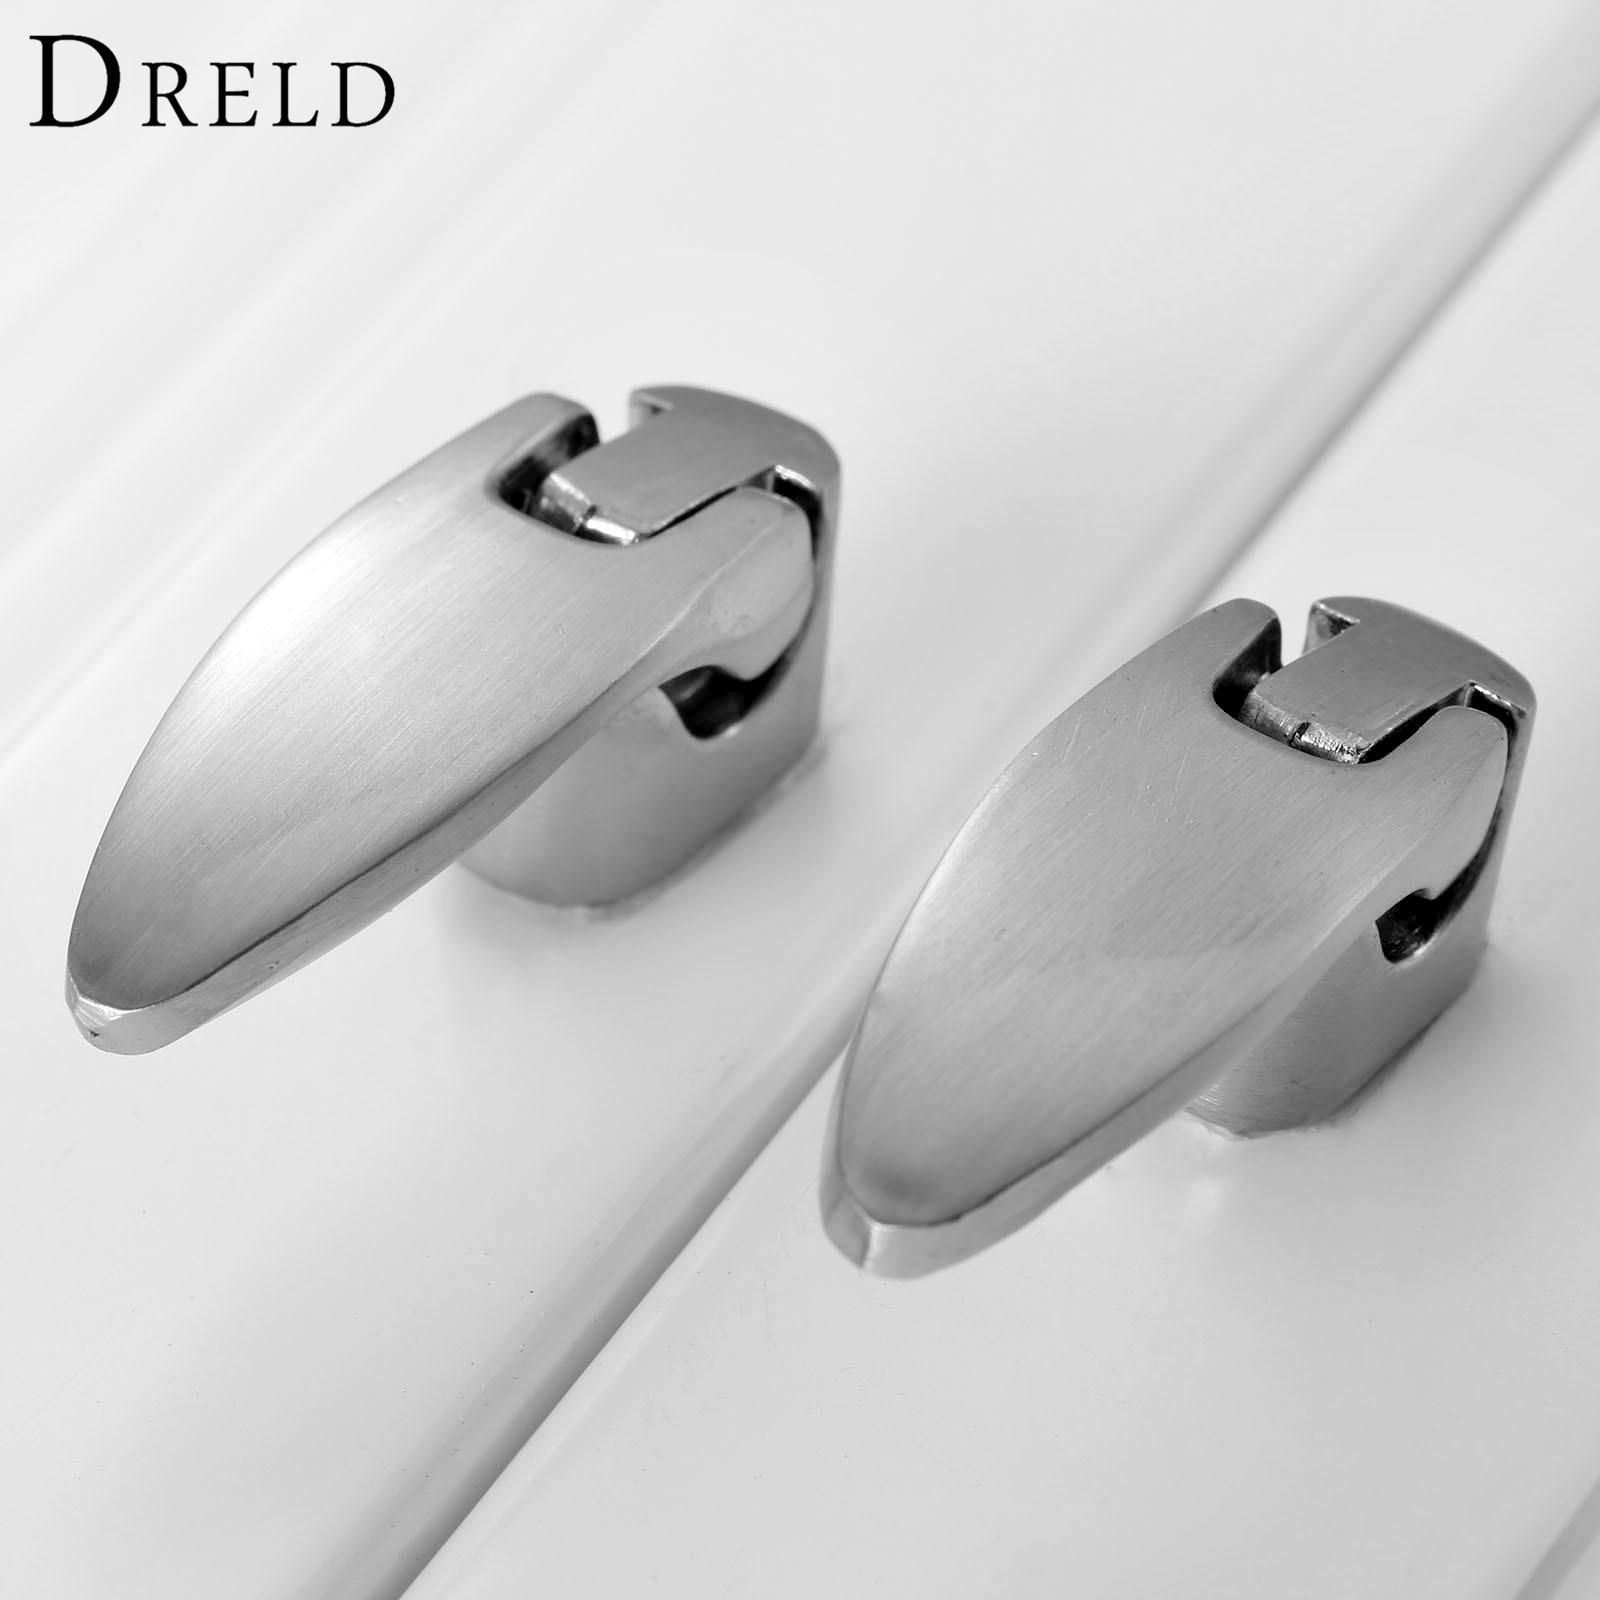 Dreld 2pcs furniture handles alloy mini pull knobs bedroom - Bedroom furniture handles and pulls ...